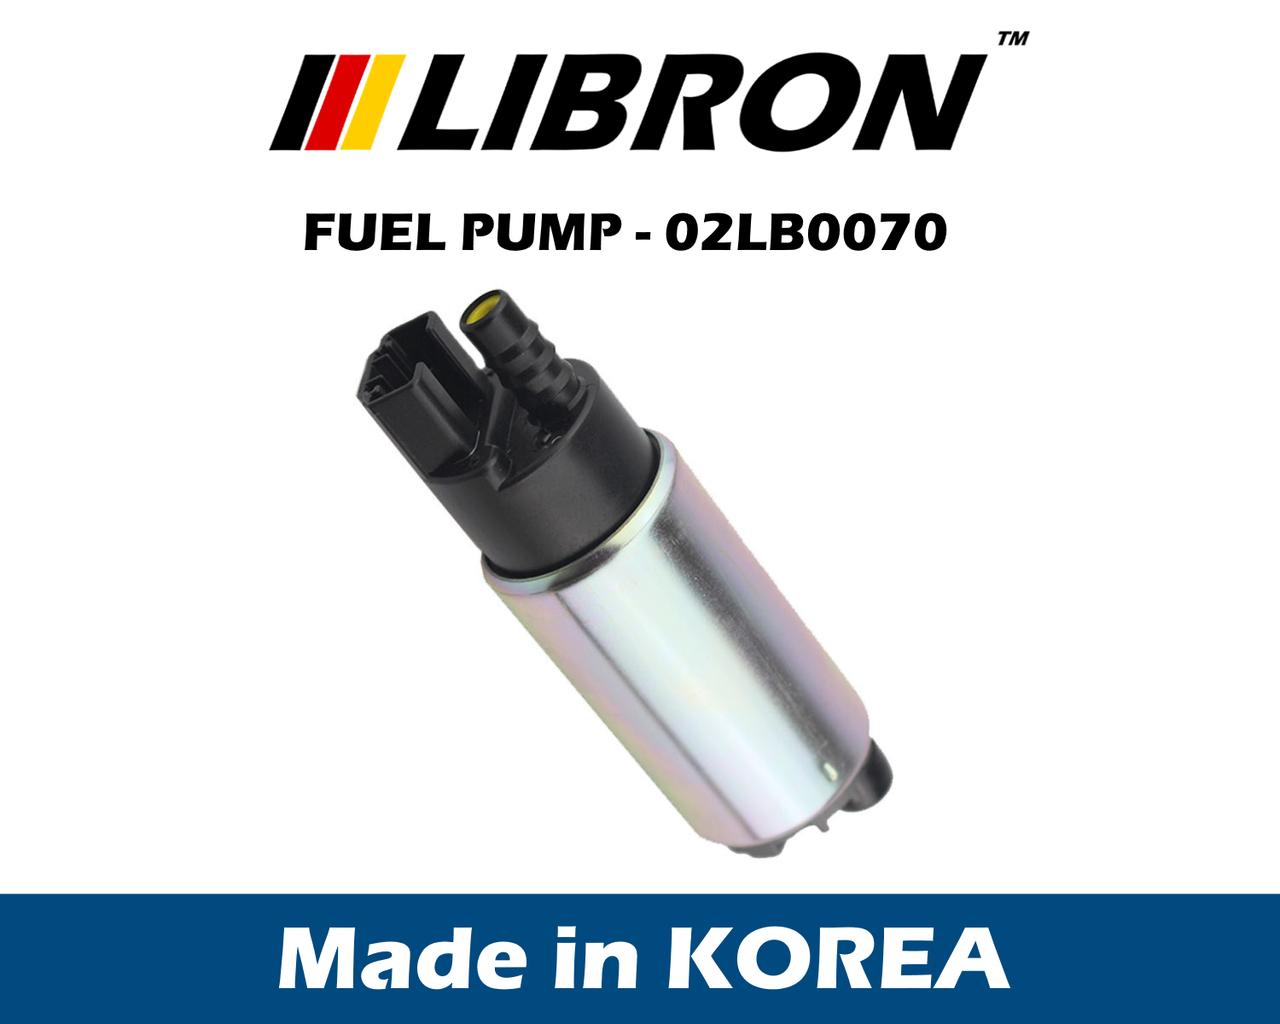 Бензонасос LIBRON 02LB0070 - SUZUKI X-90 (1995-1997)